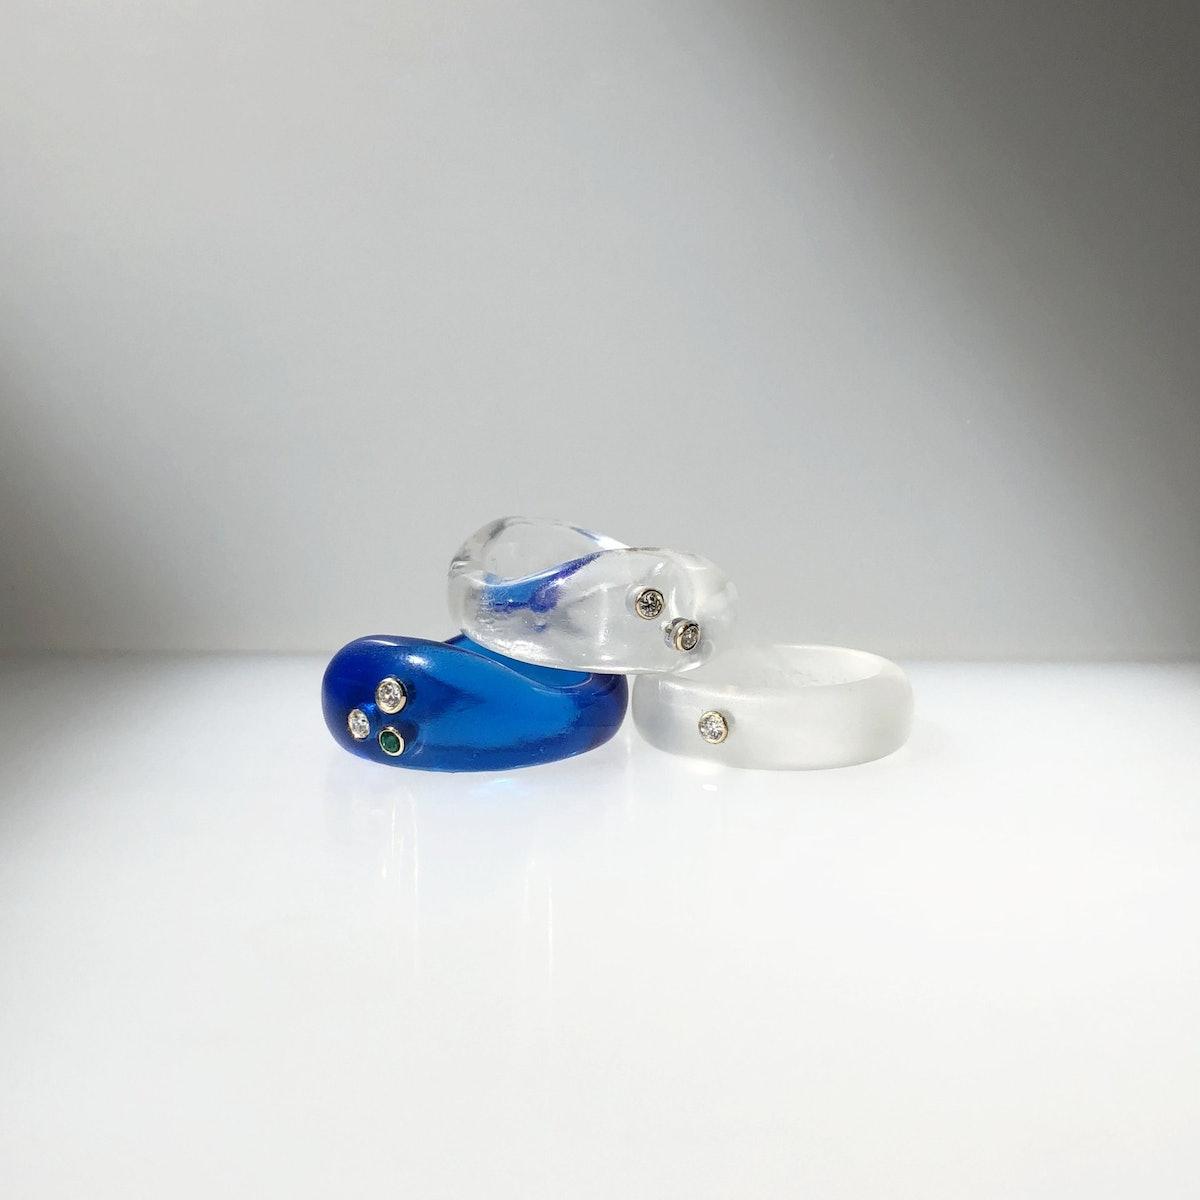 Resin Gemstone Add-On Ring